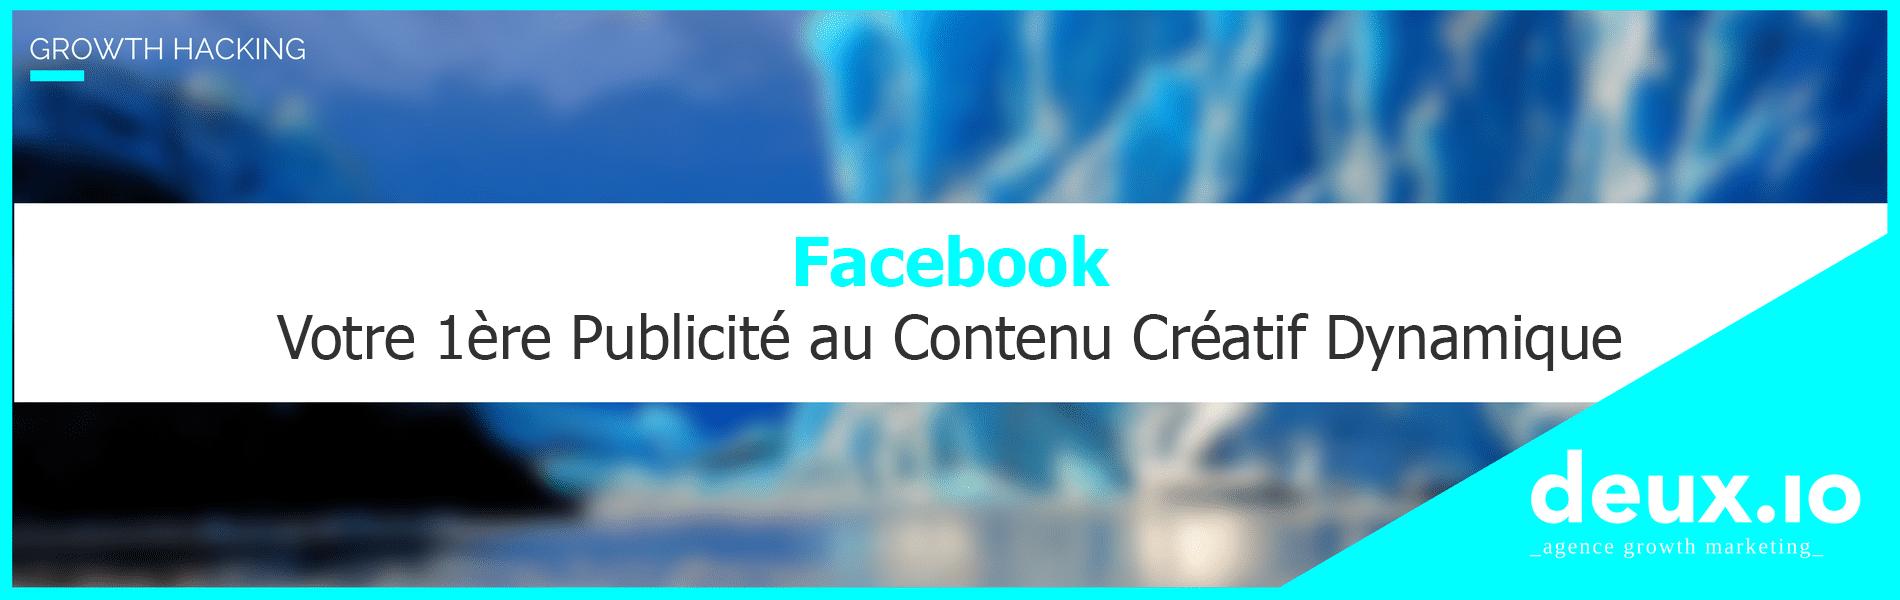 Tuto_contenu_creatif_dynamique